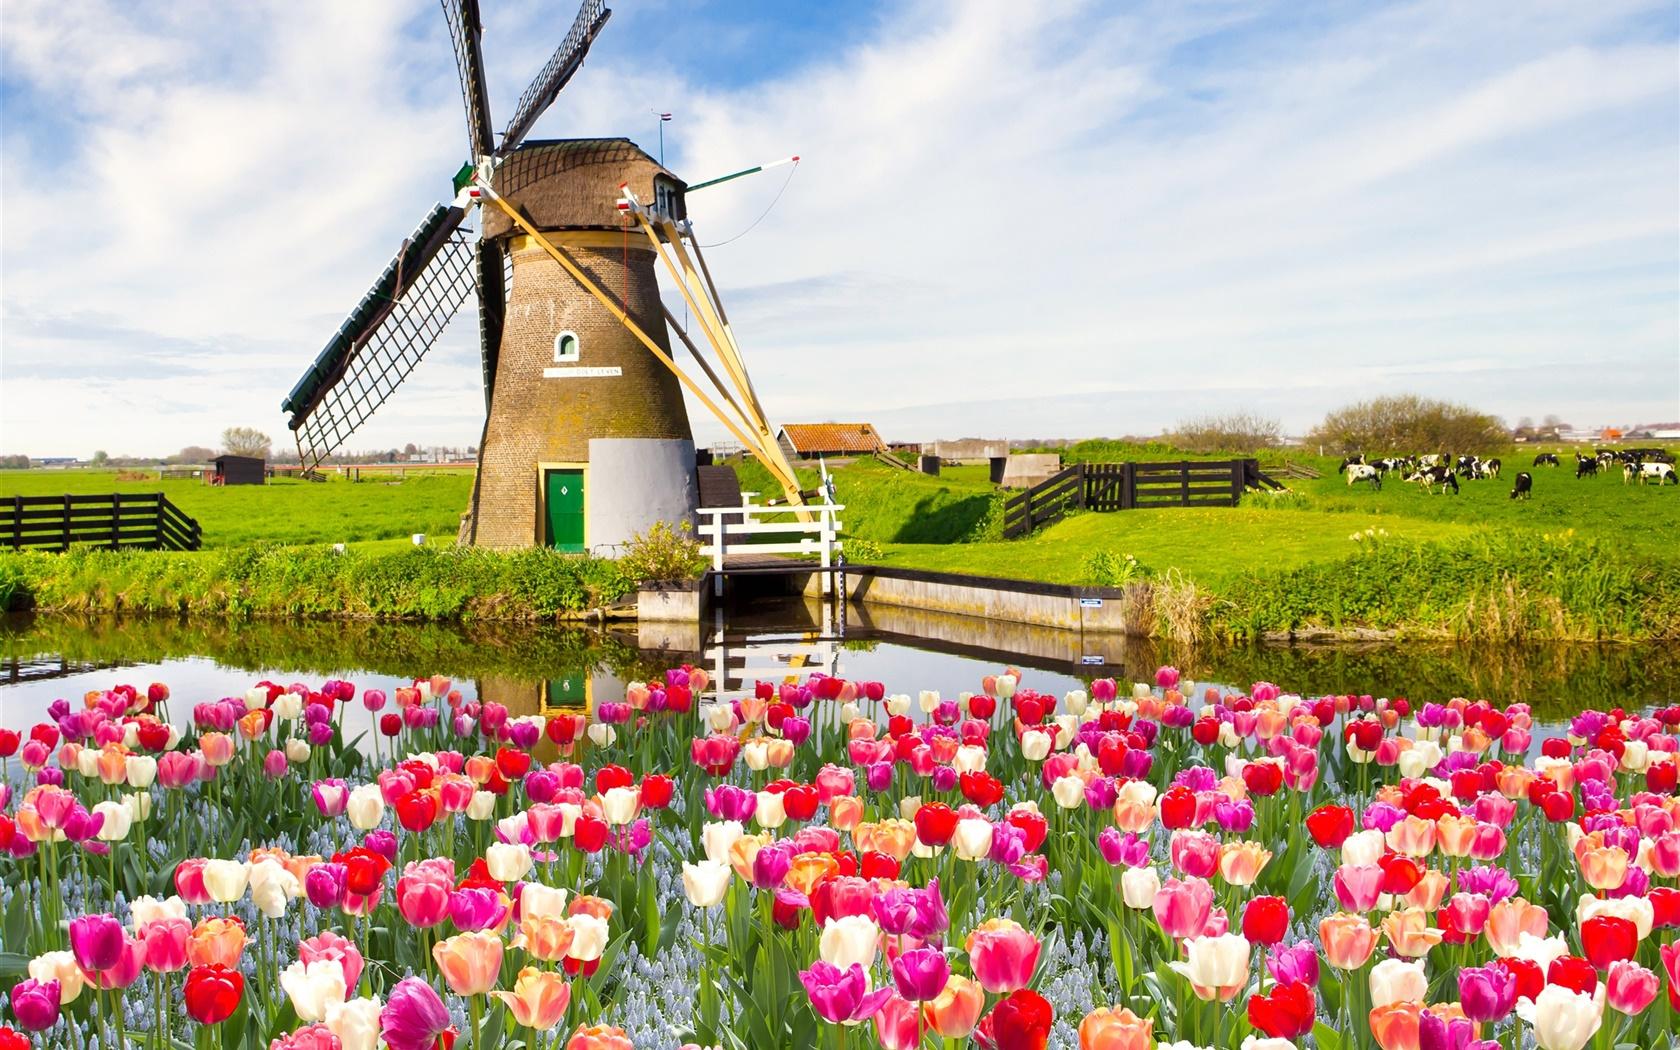 Village moulin vent fleurs de tulipes rivi re la for Sfondi desktop primavera